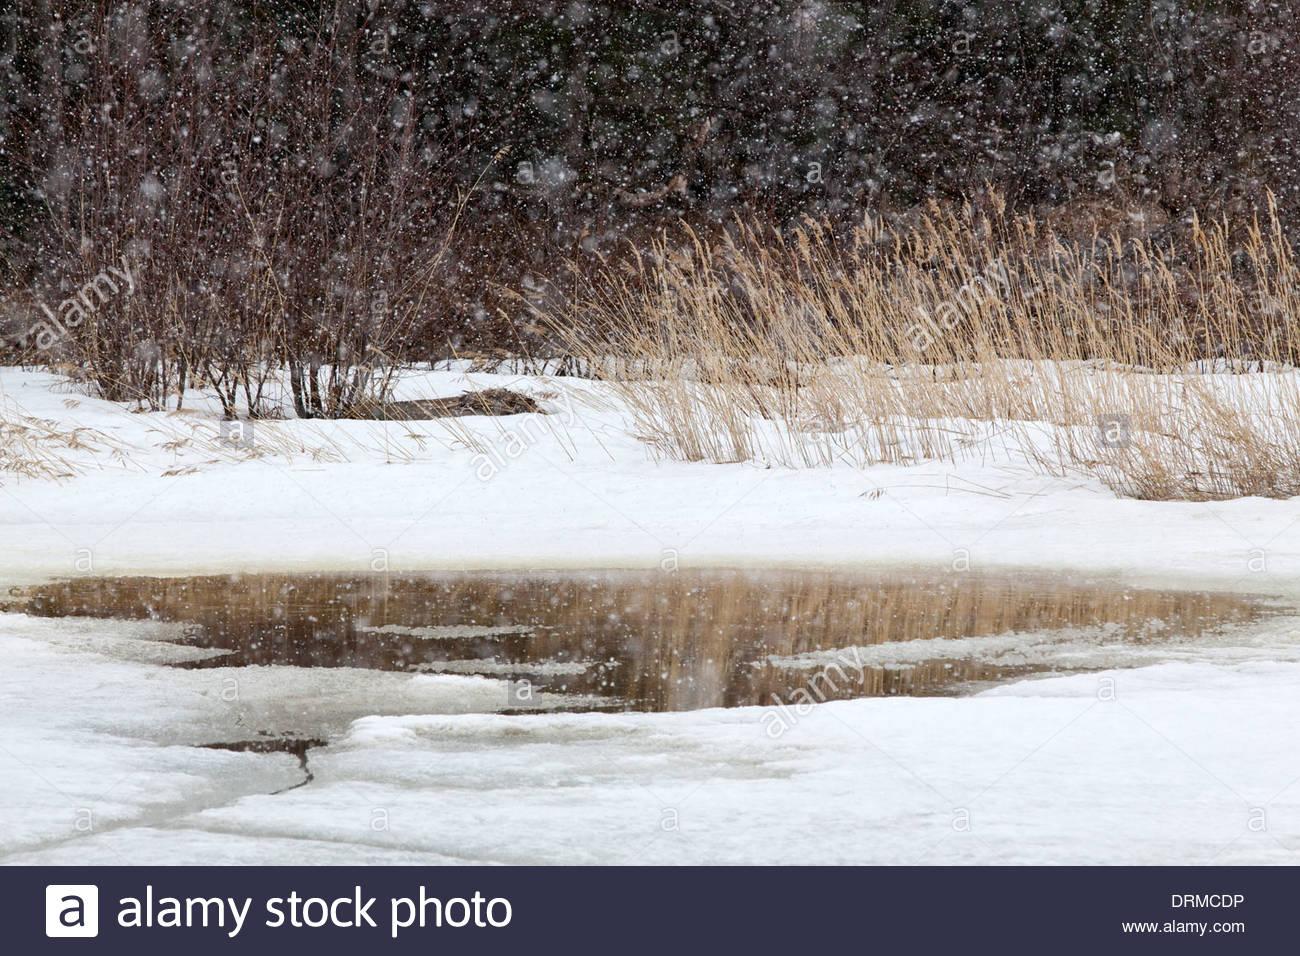 Sleet at late winter - Stock Image